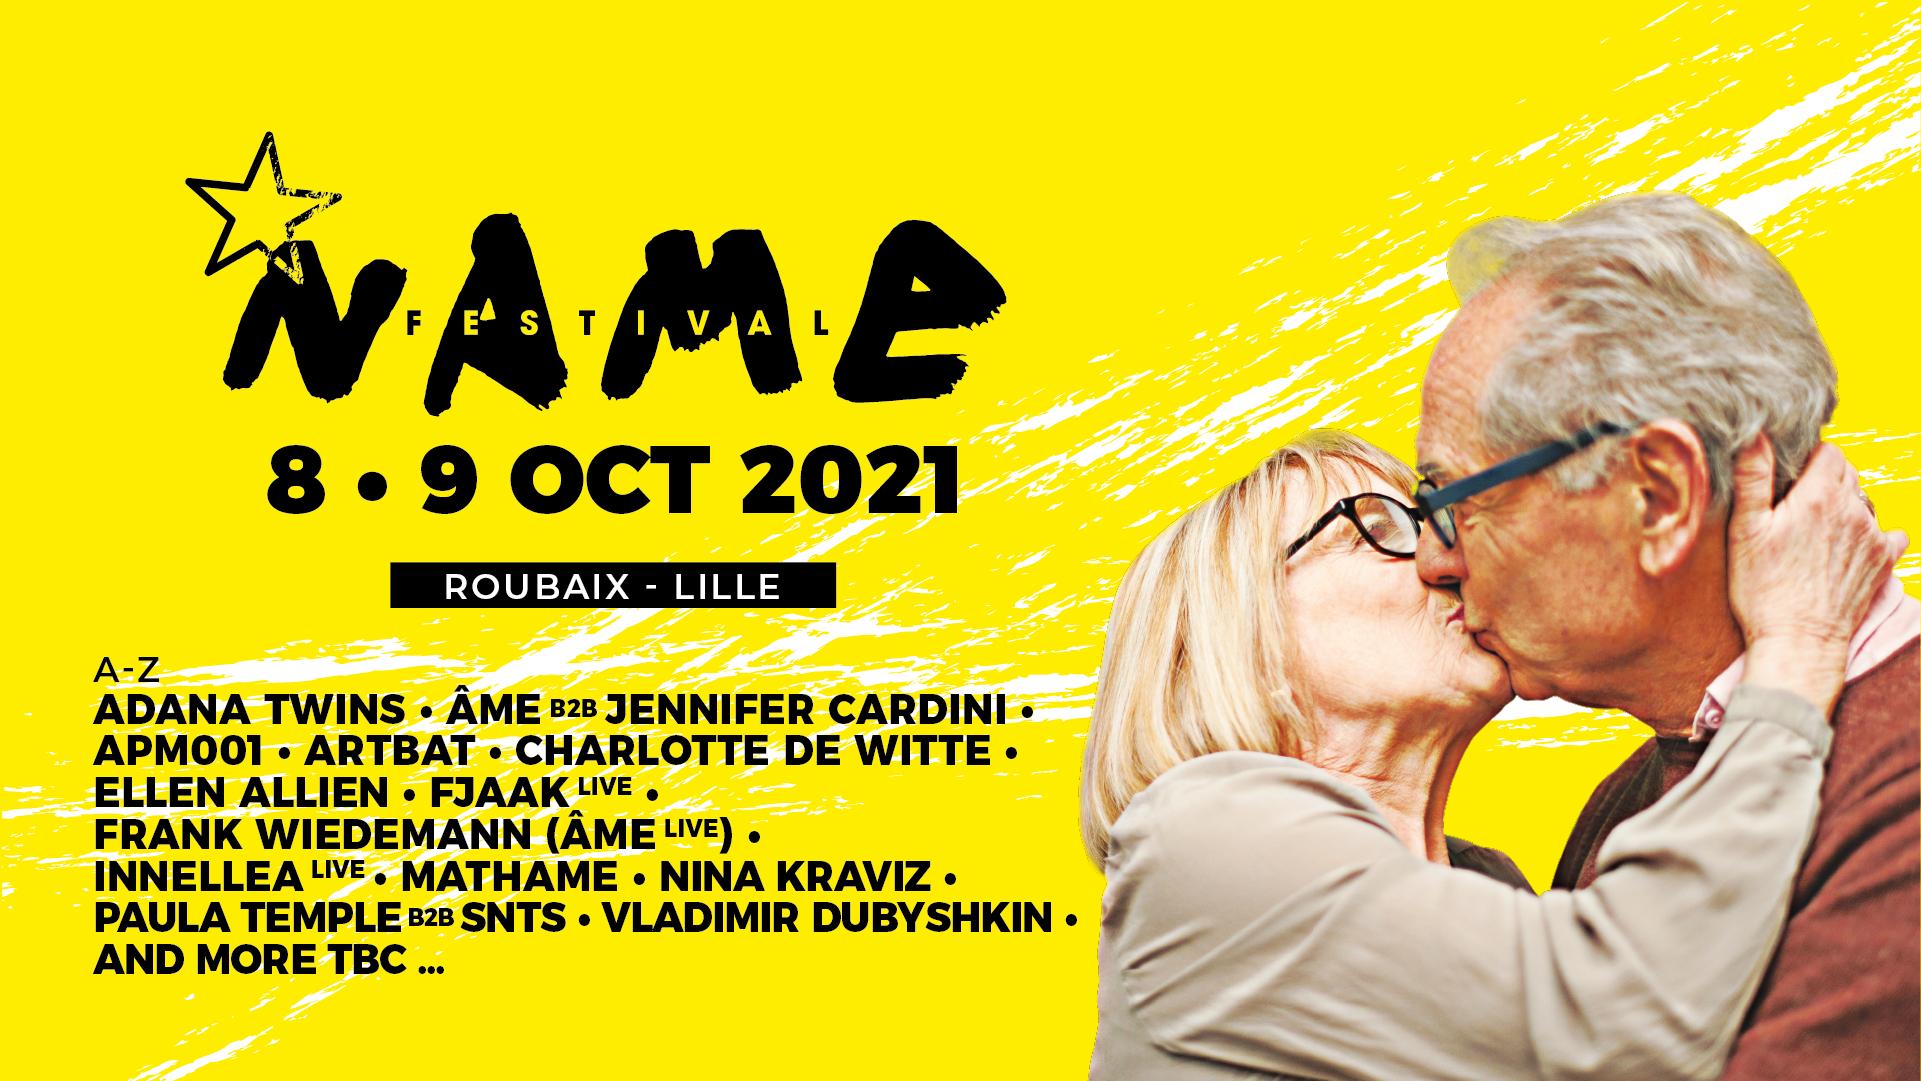 NAME festival 2021